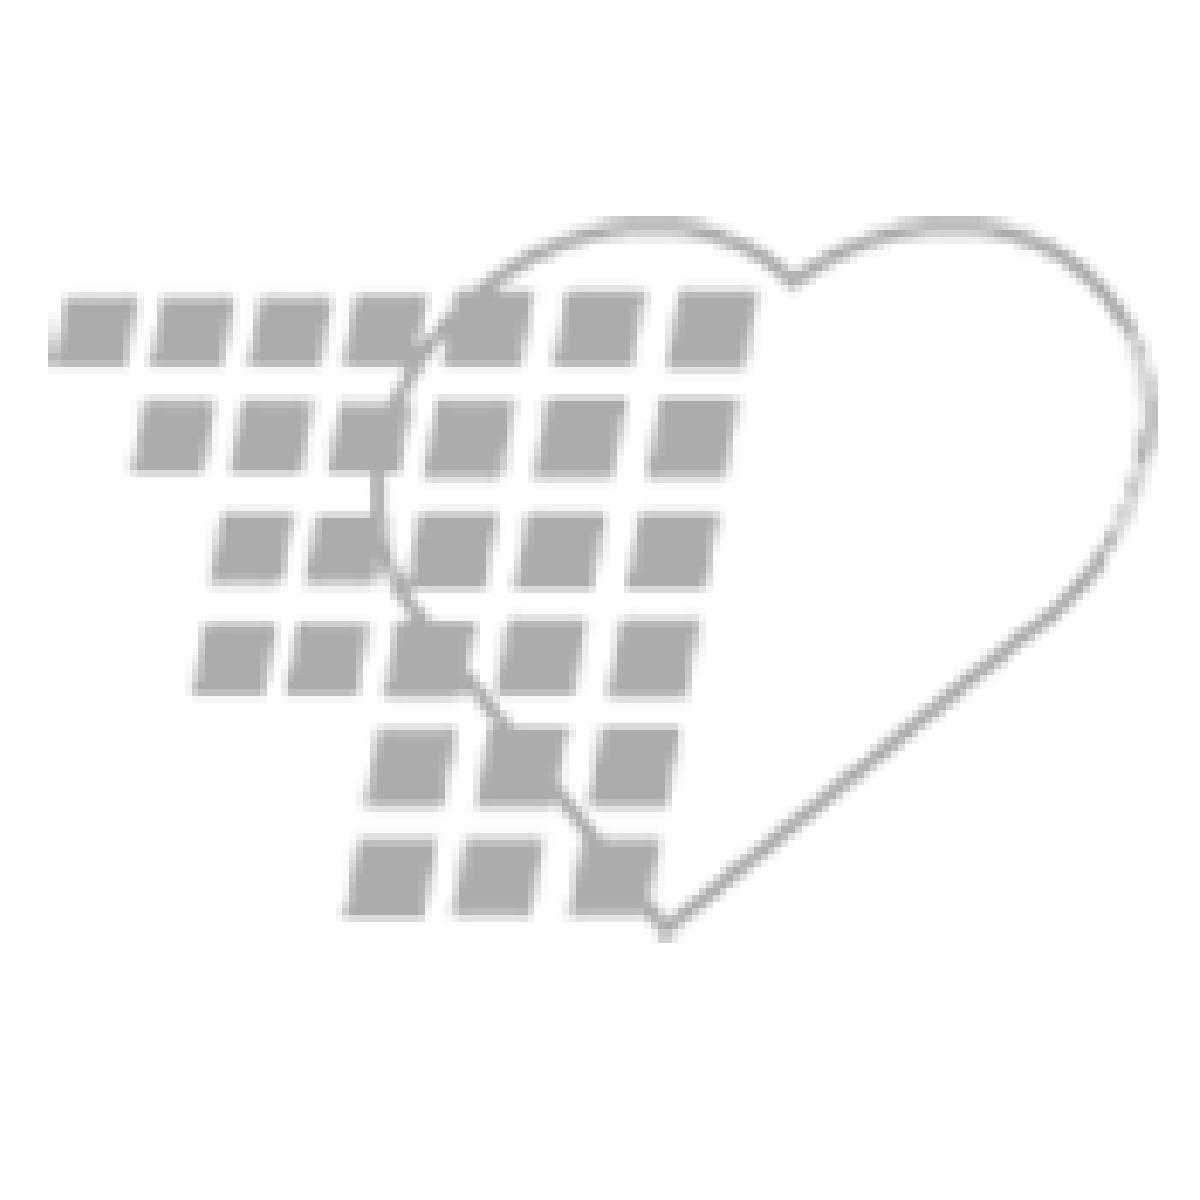 02-43-0470 - CardioSens Ultra II Electrodes